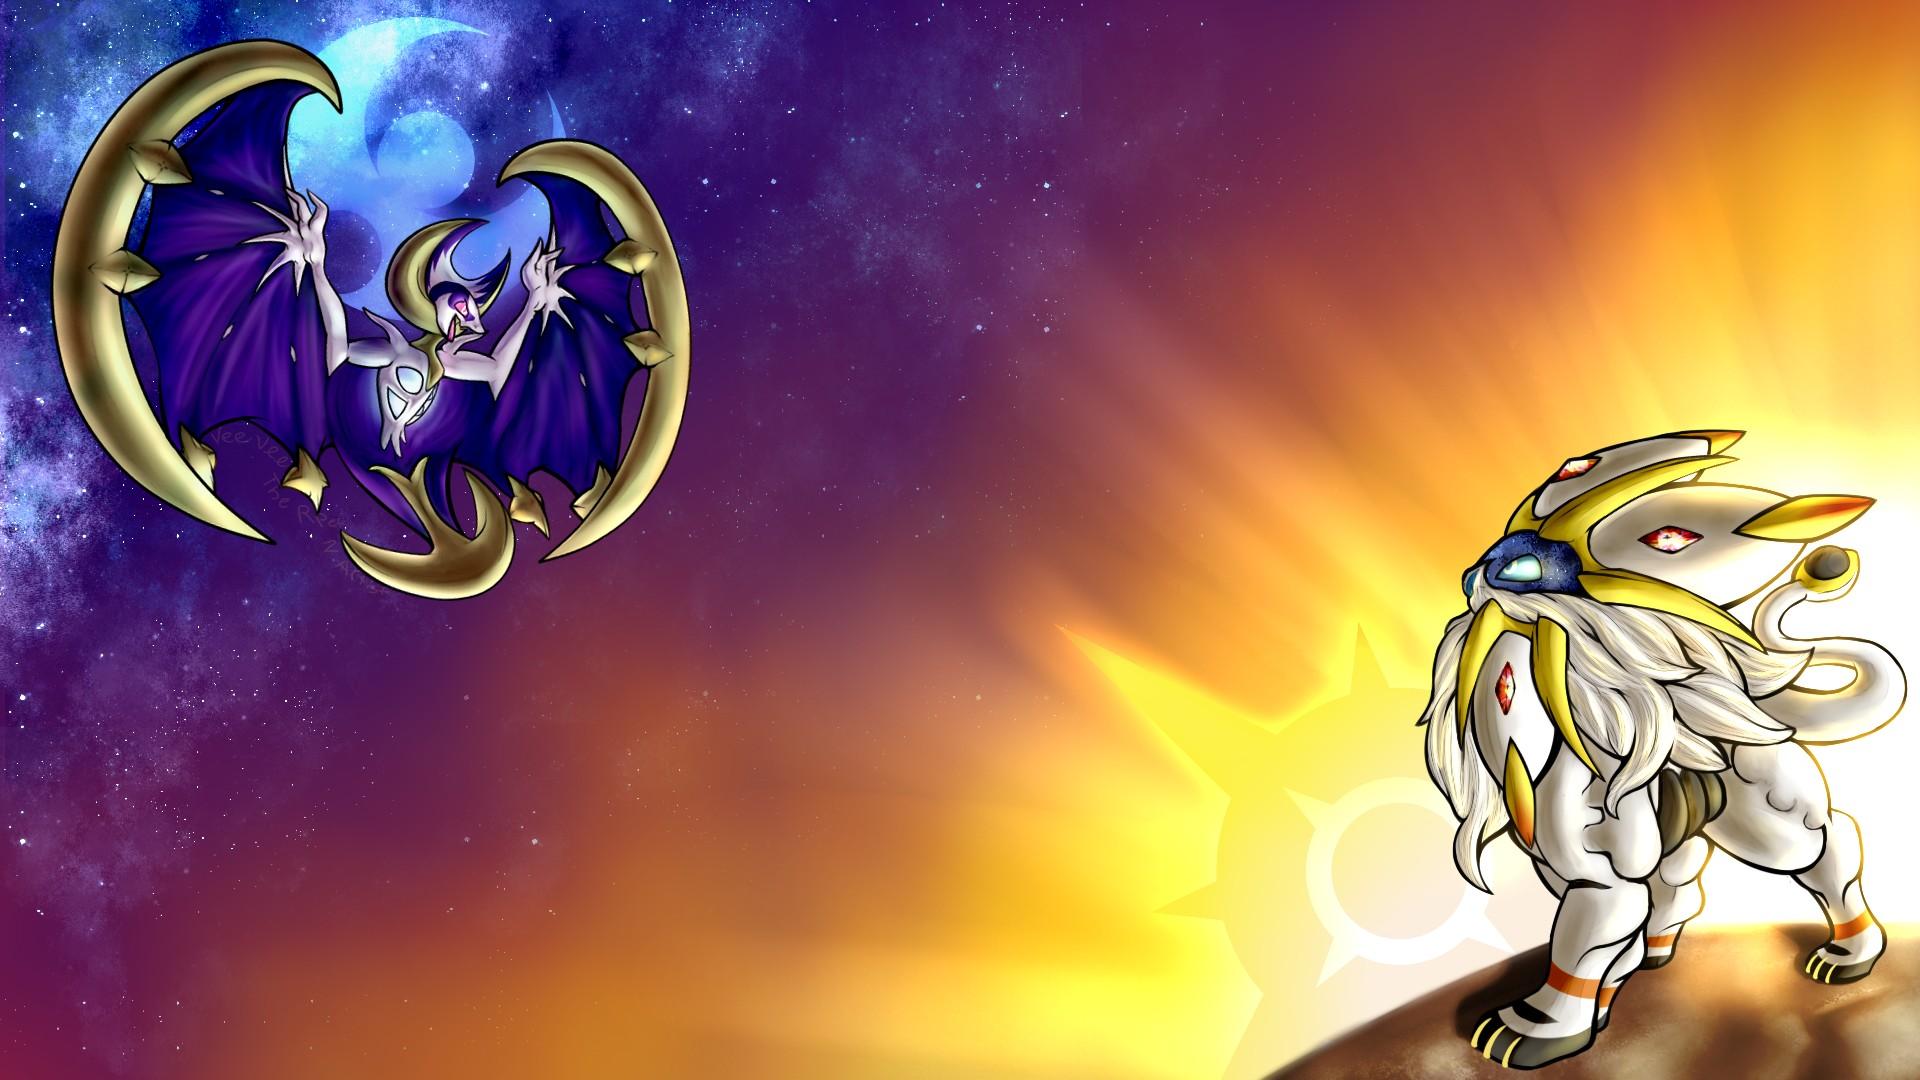 pokemon sun and moon wallpaper 183�� download free full hd